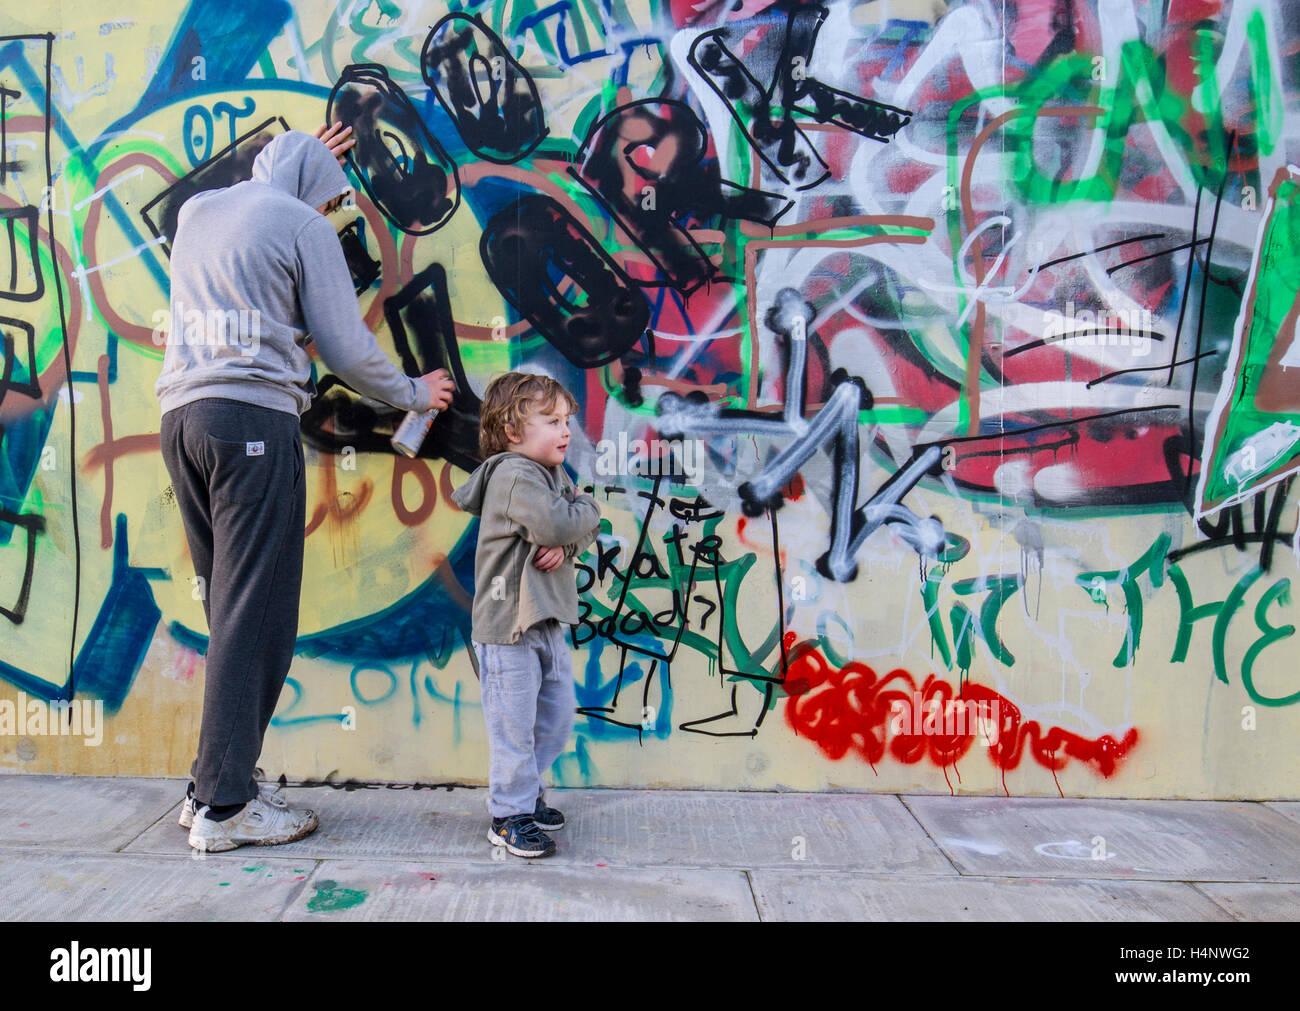 hoody teen spraying graffiti on wall with boy - Stock Image